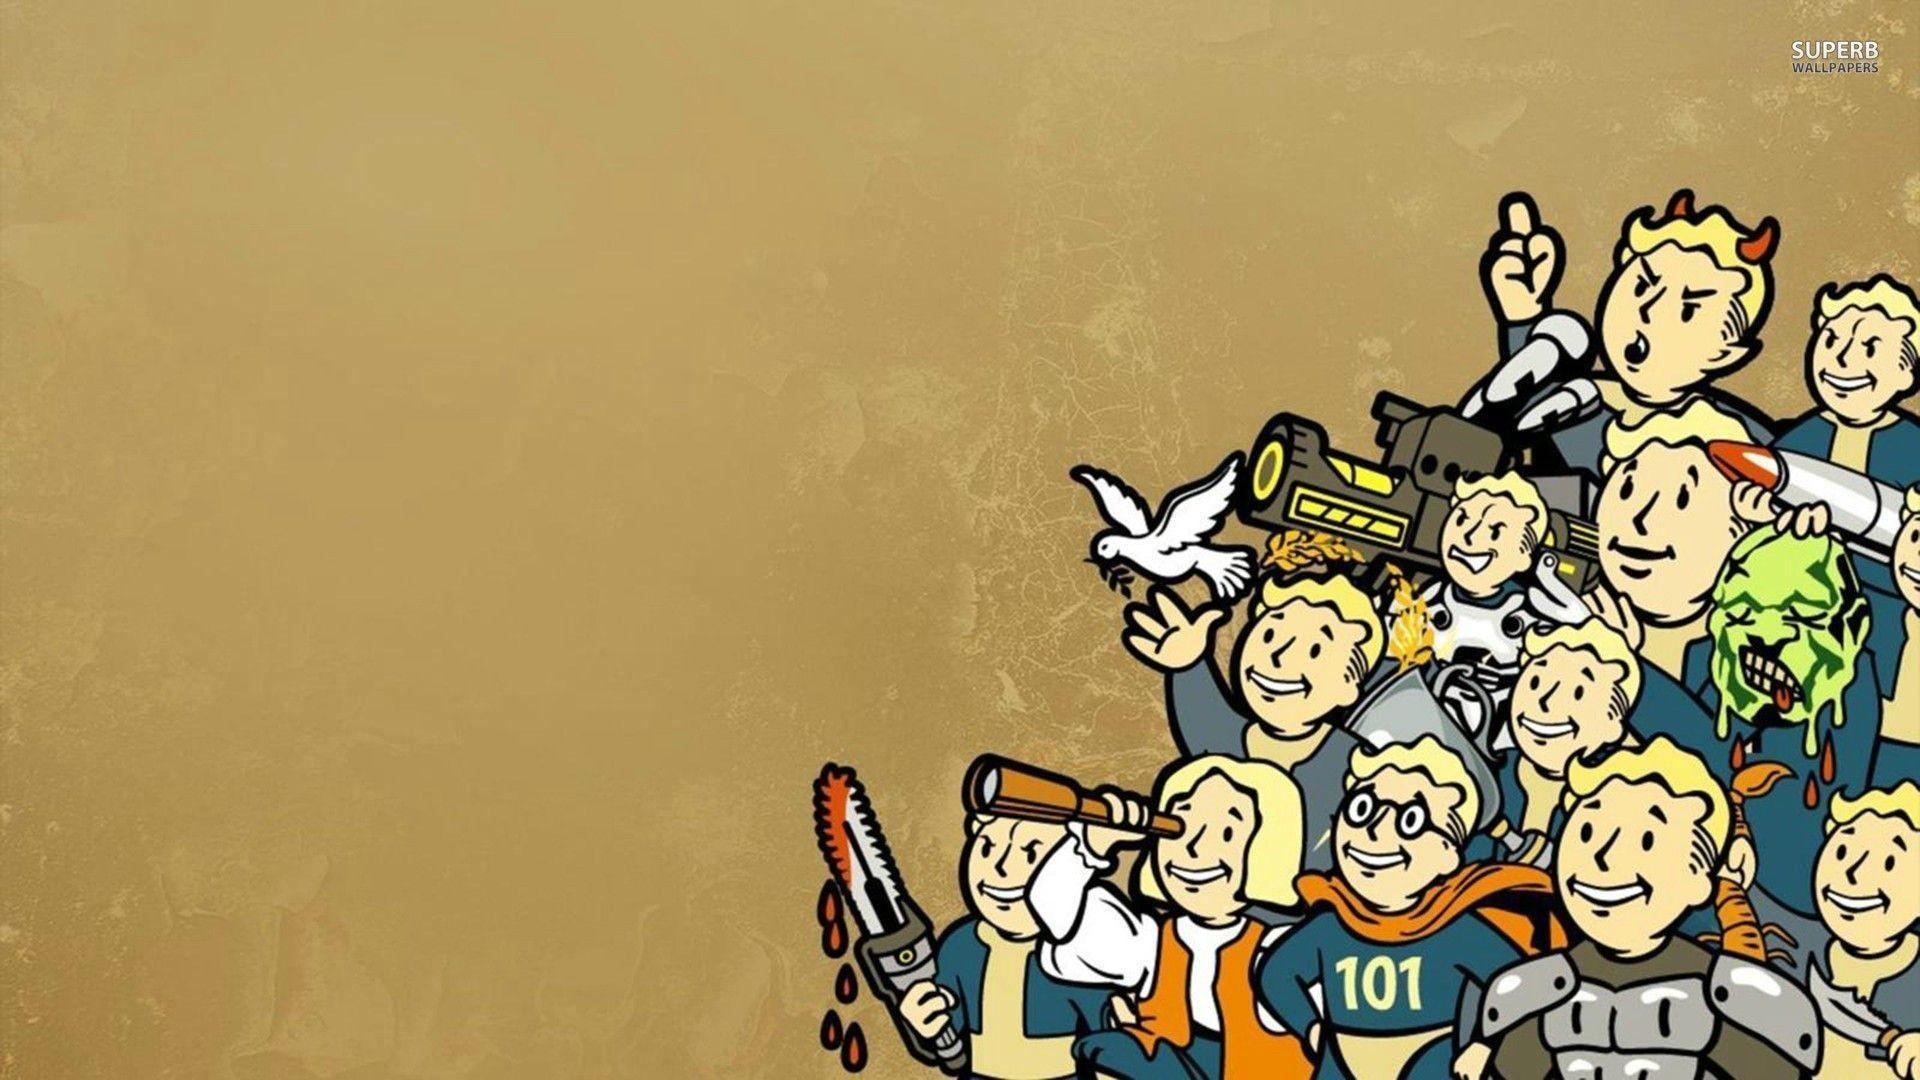 Vault Boy – Fallout wallpaper – Game wallpapers – #25384